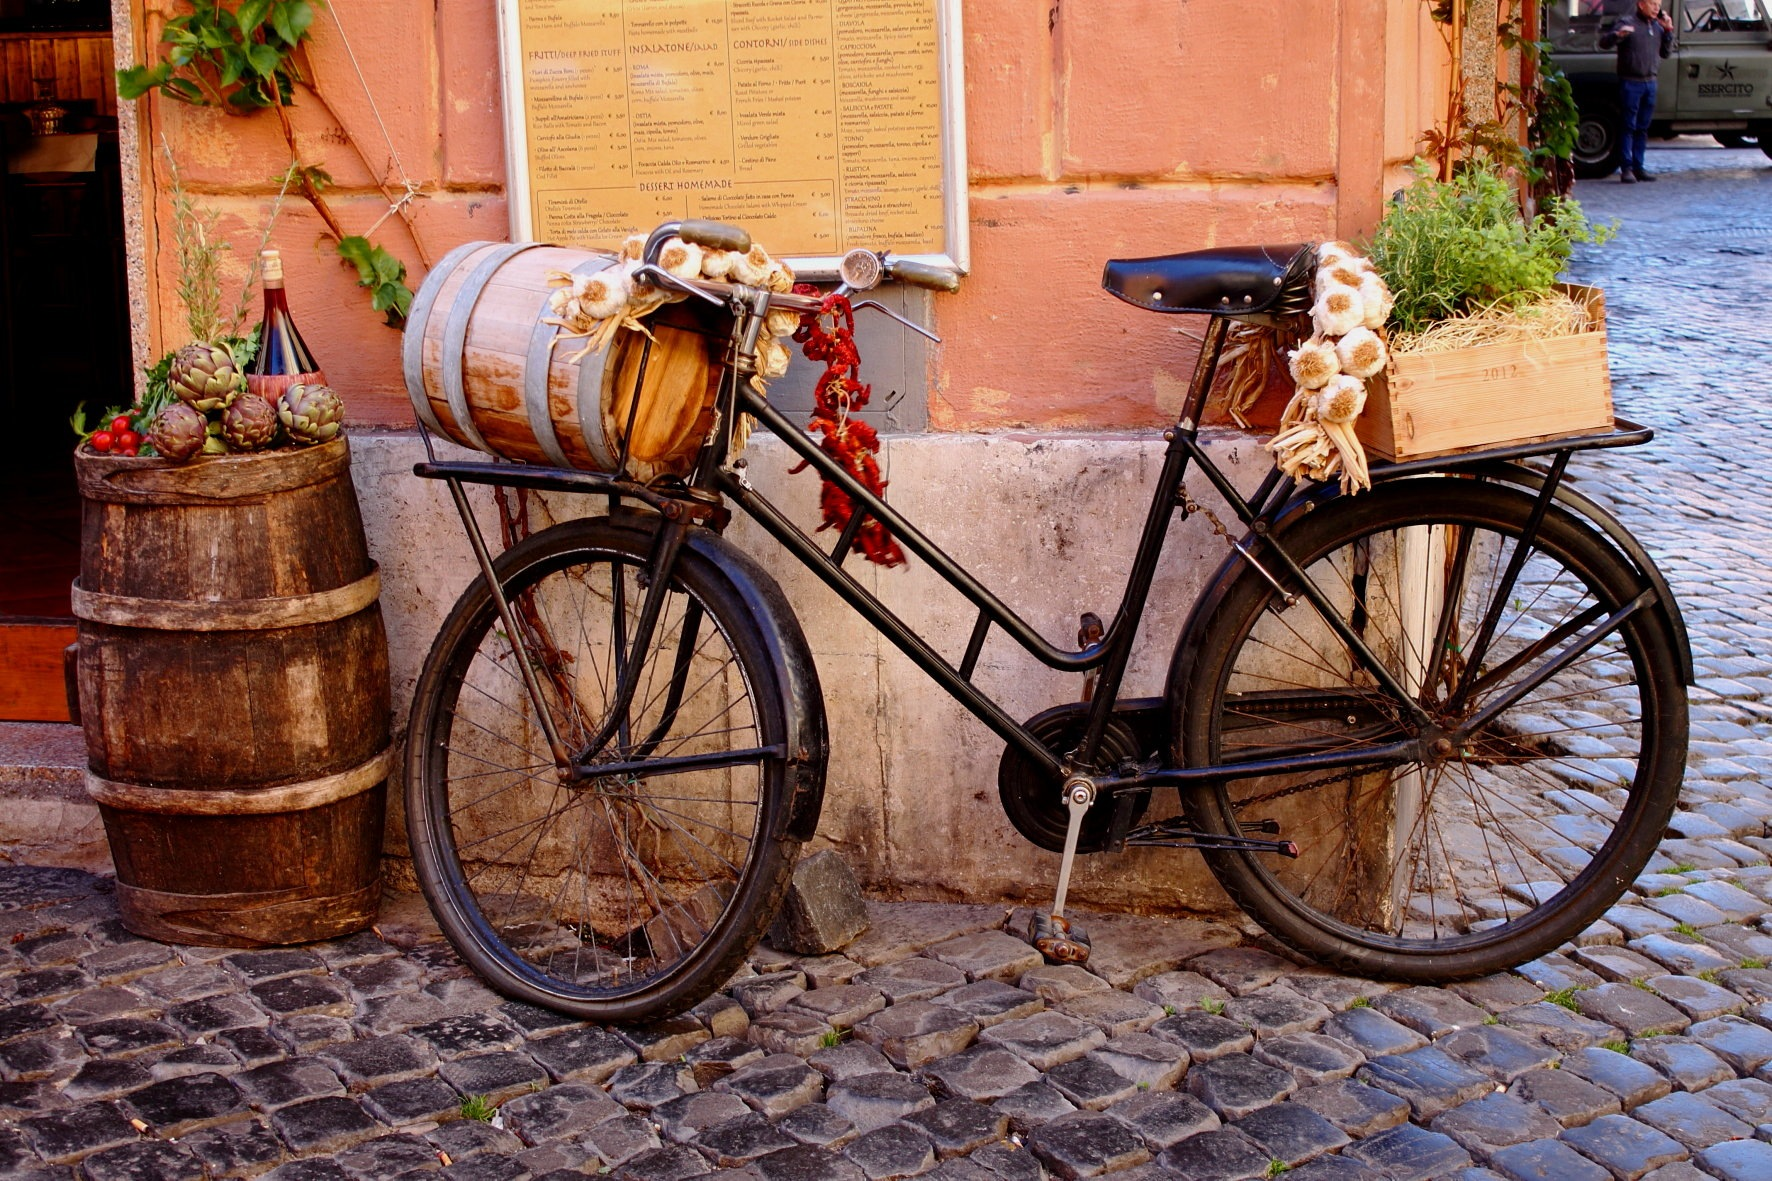 Roma. Trastevere by Salvatore Bertolino